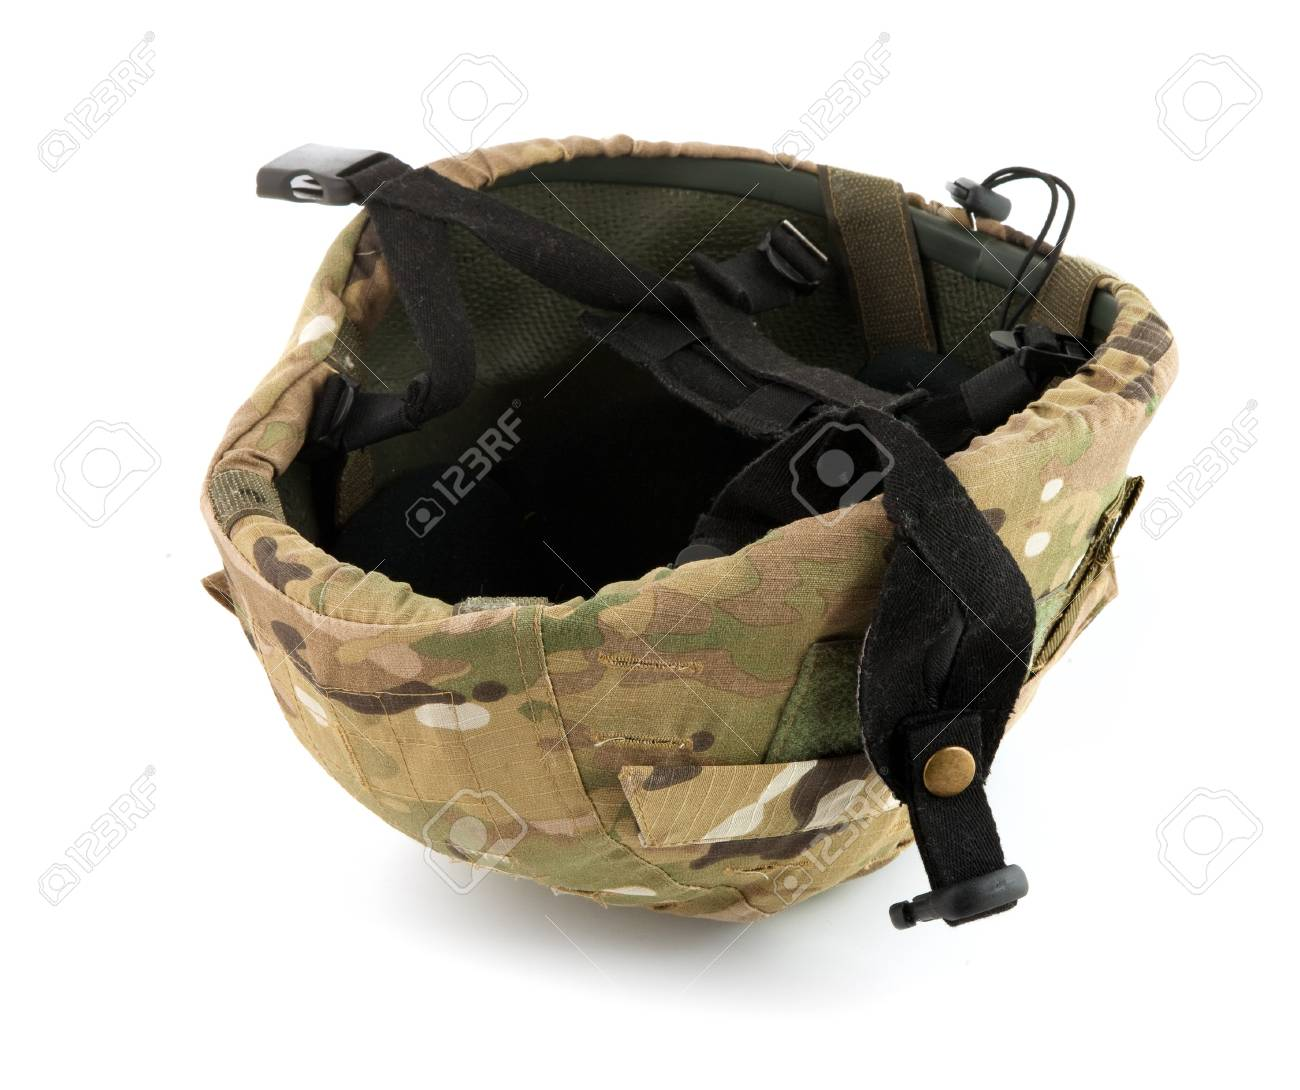 Casco militar aislar sobre un fondo blanco Foto de archivo - 7998189 5bc7f0552e8